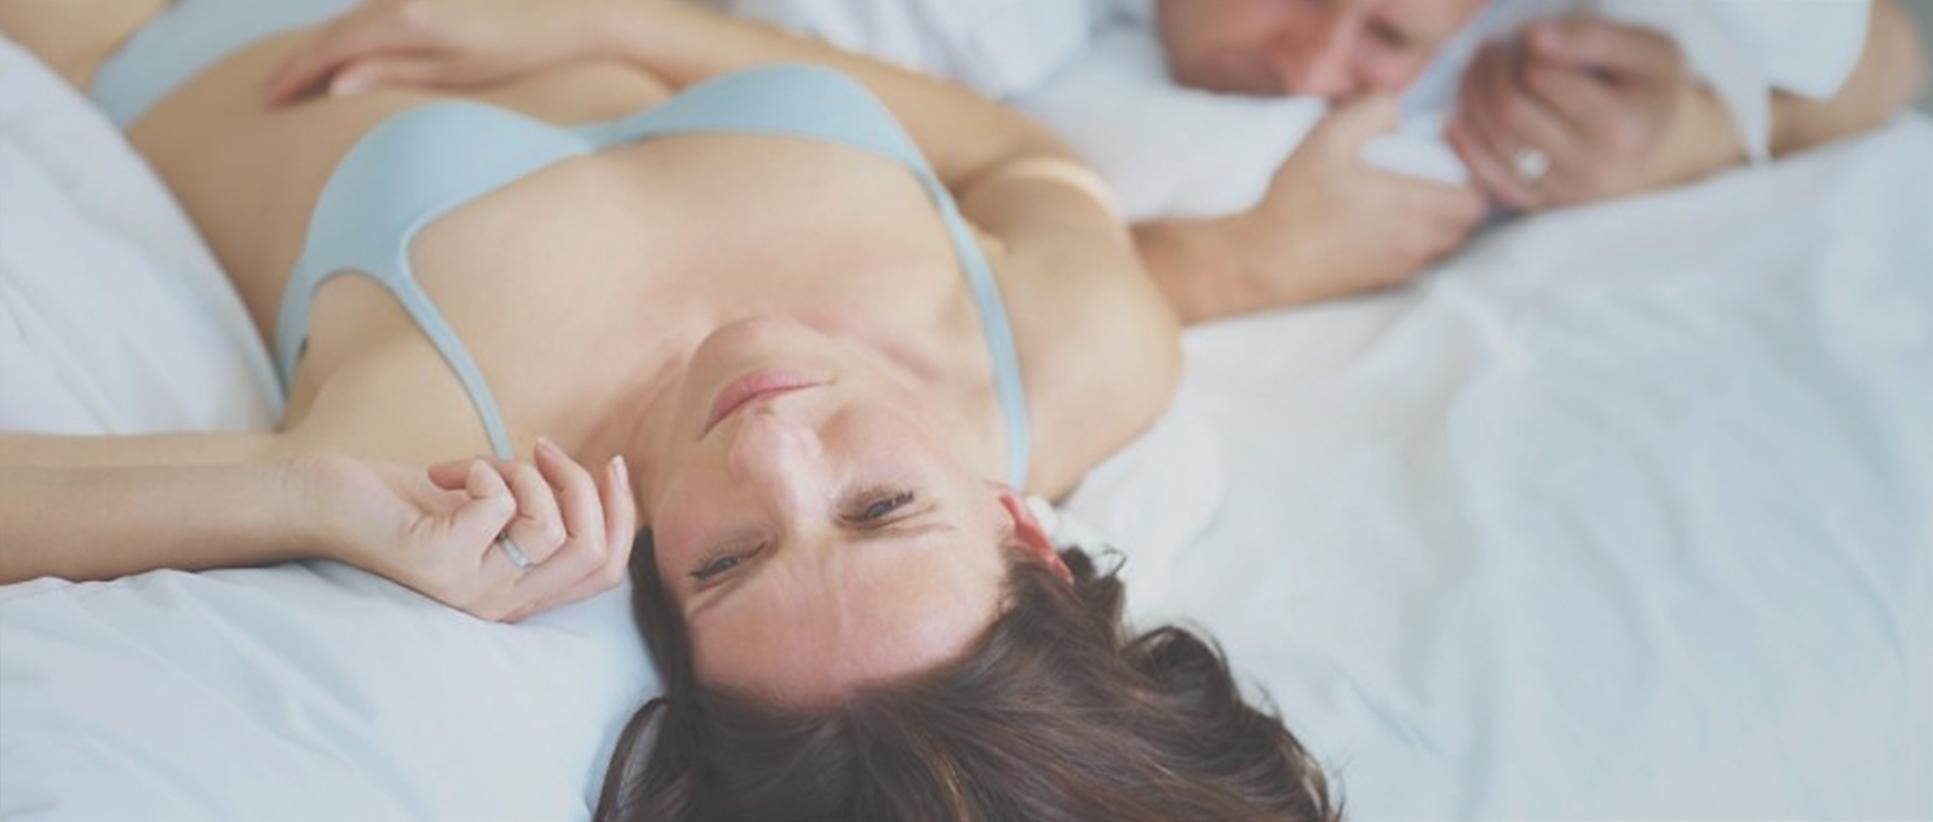 mitos e verdades sobre sexo